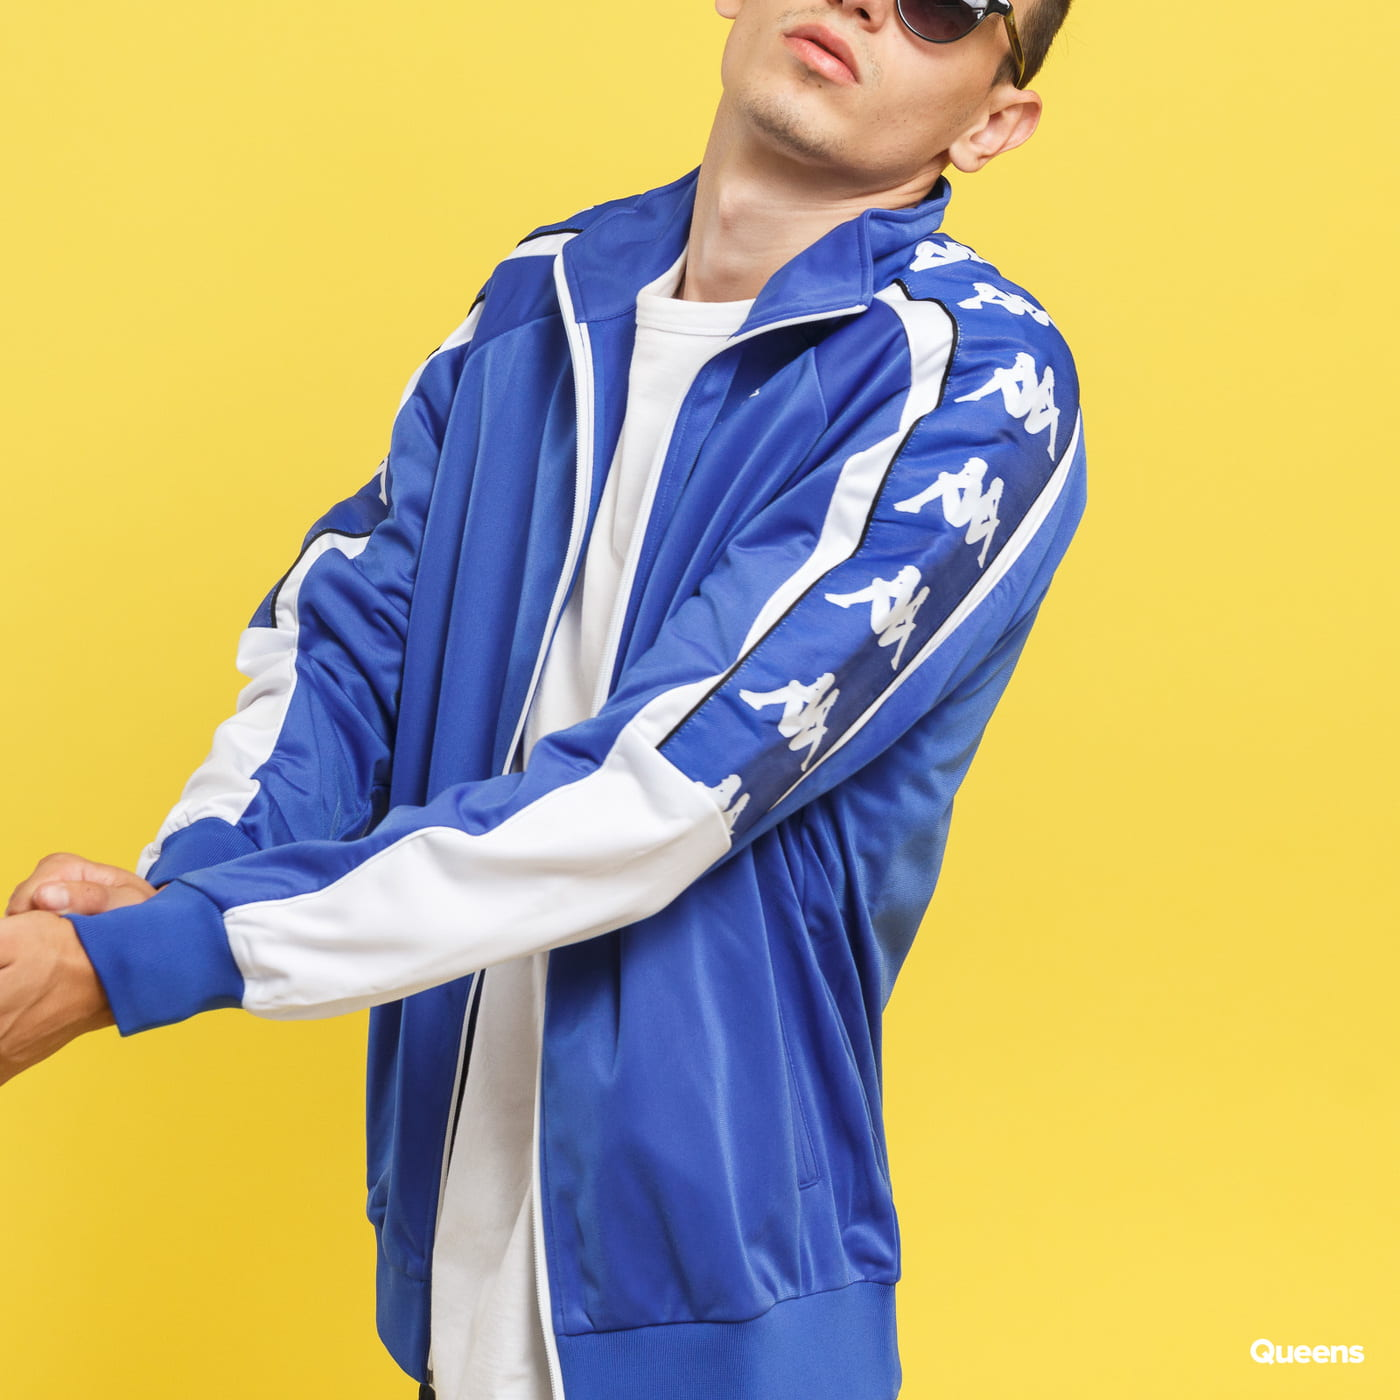 Kappa Banda 10 Ahran blau / weiß